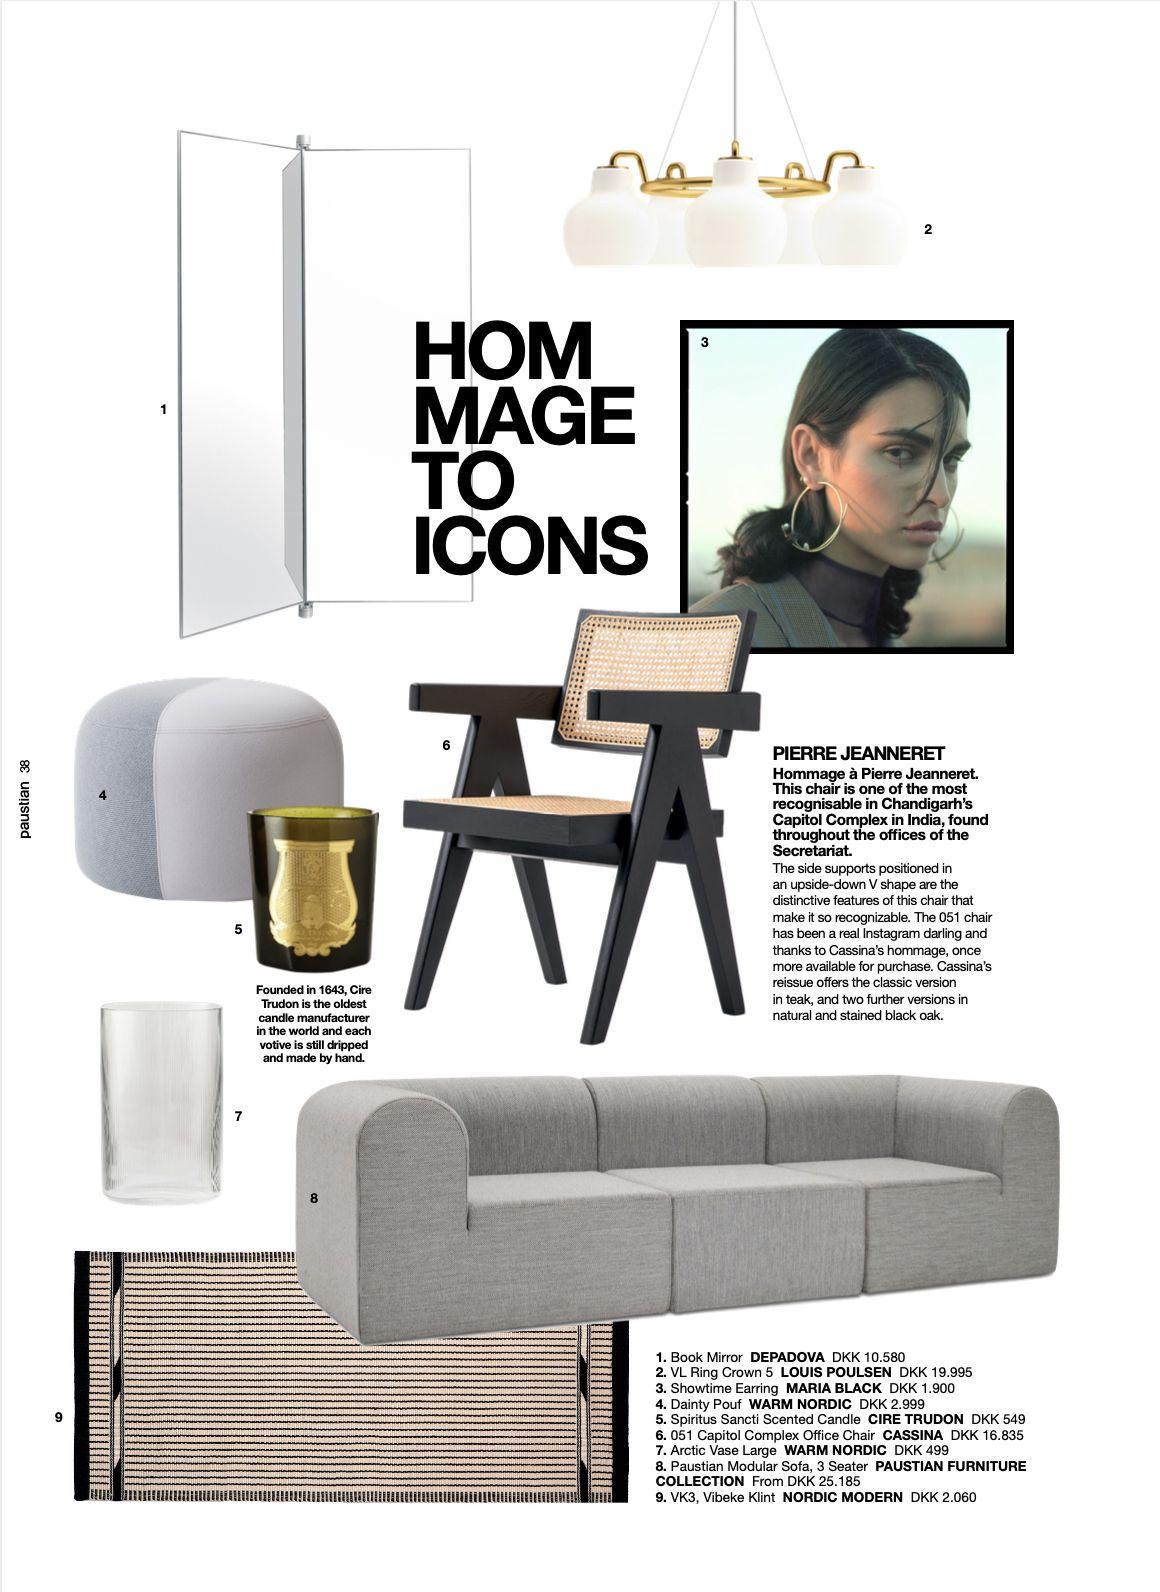 paustian magazine vol.2 | layout design, layout, design